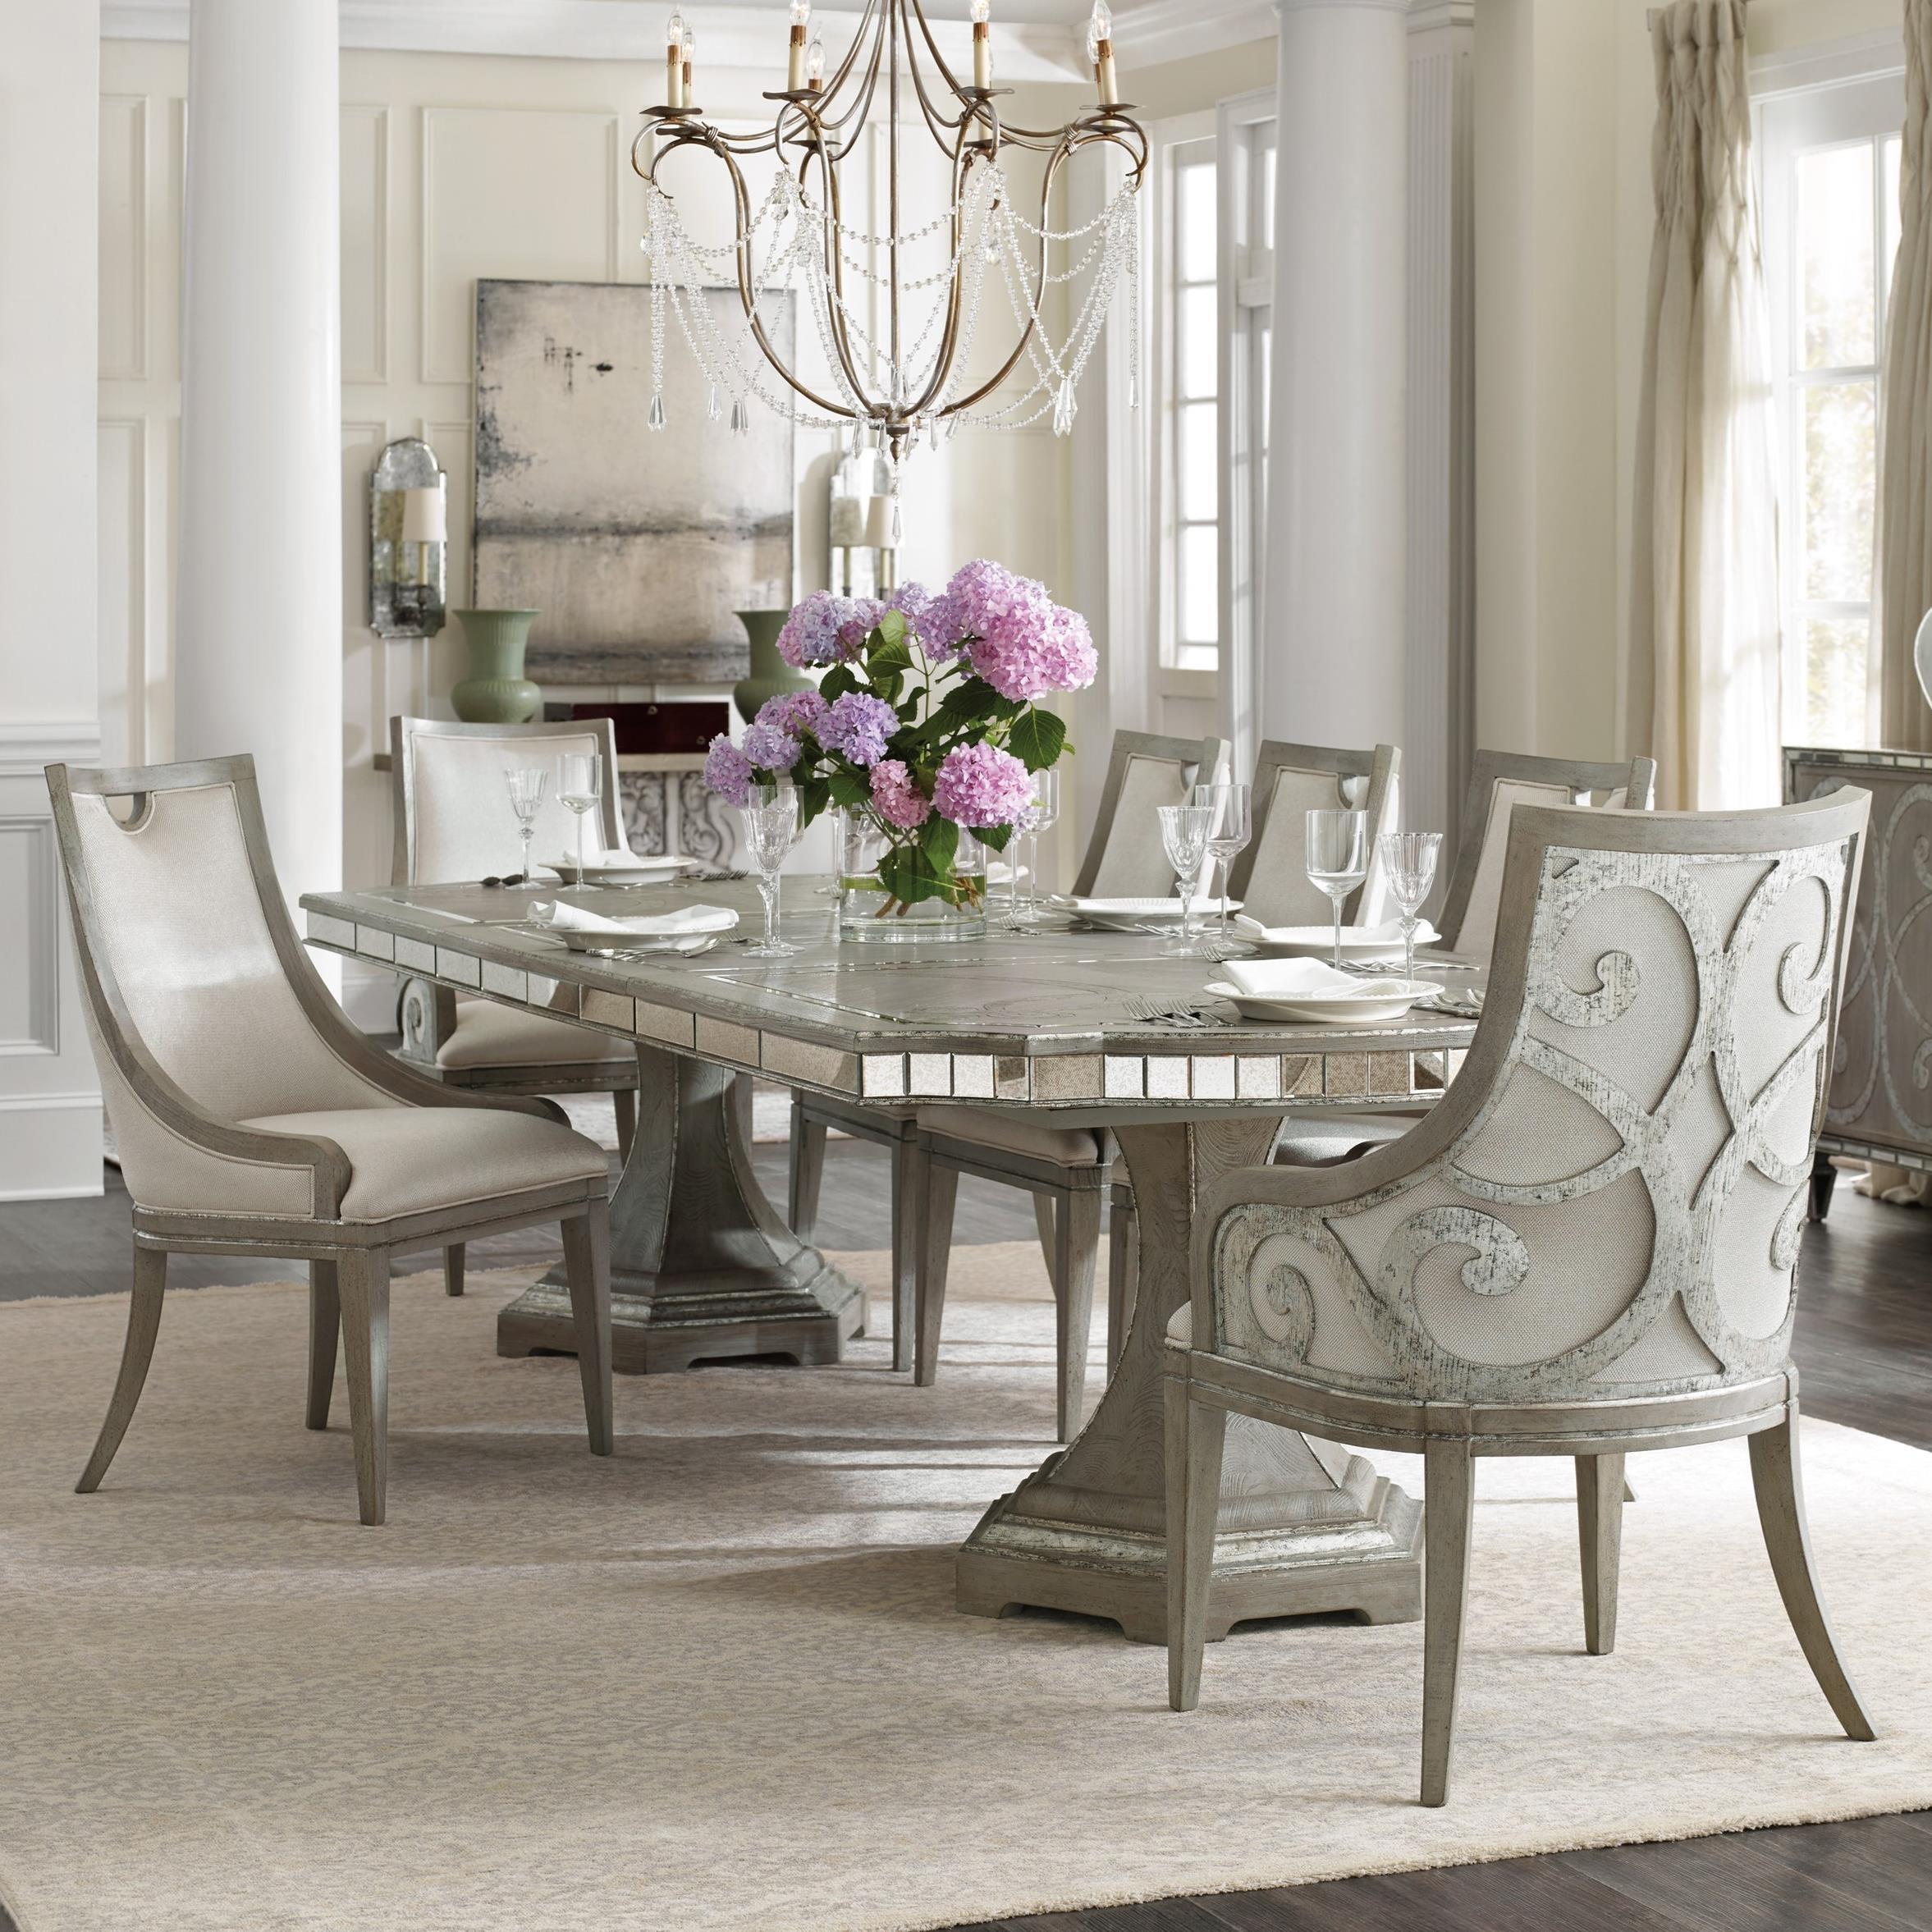 Hooker Furniture Sanctuary Transitional 7-Piece Dining Set